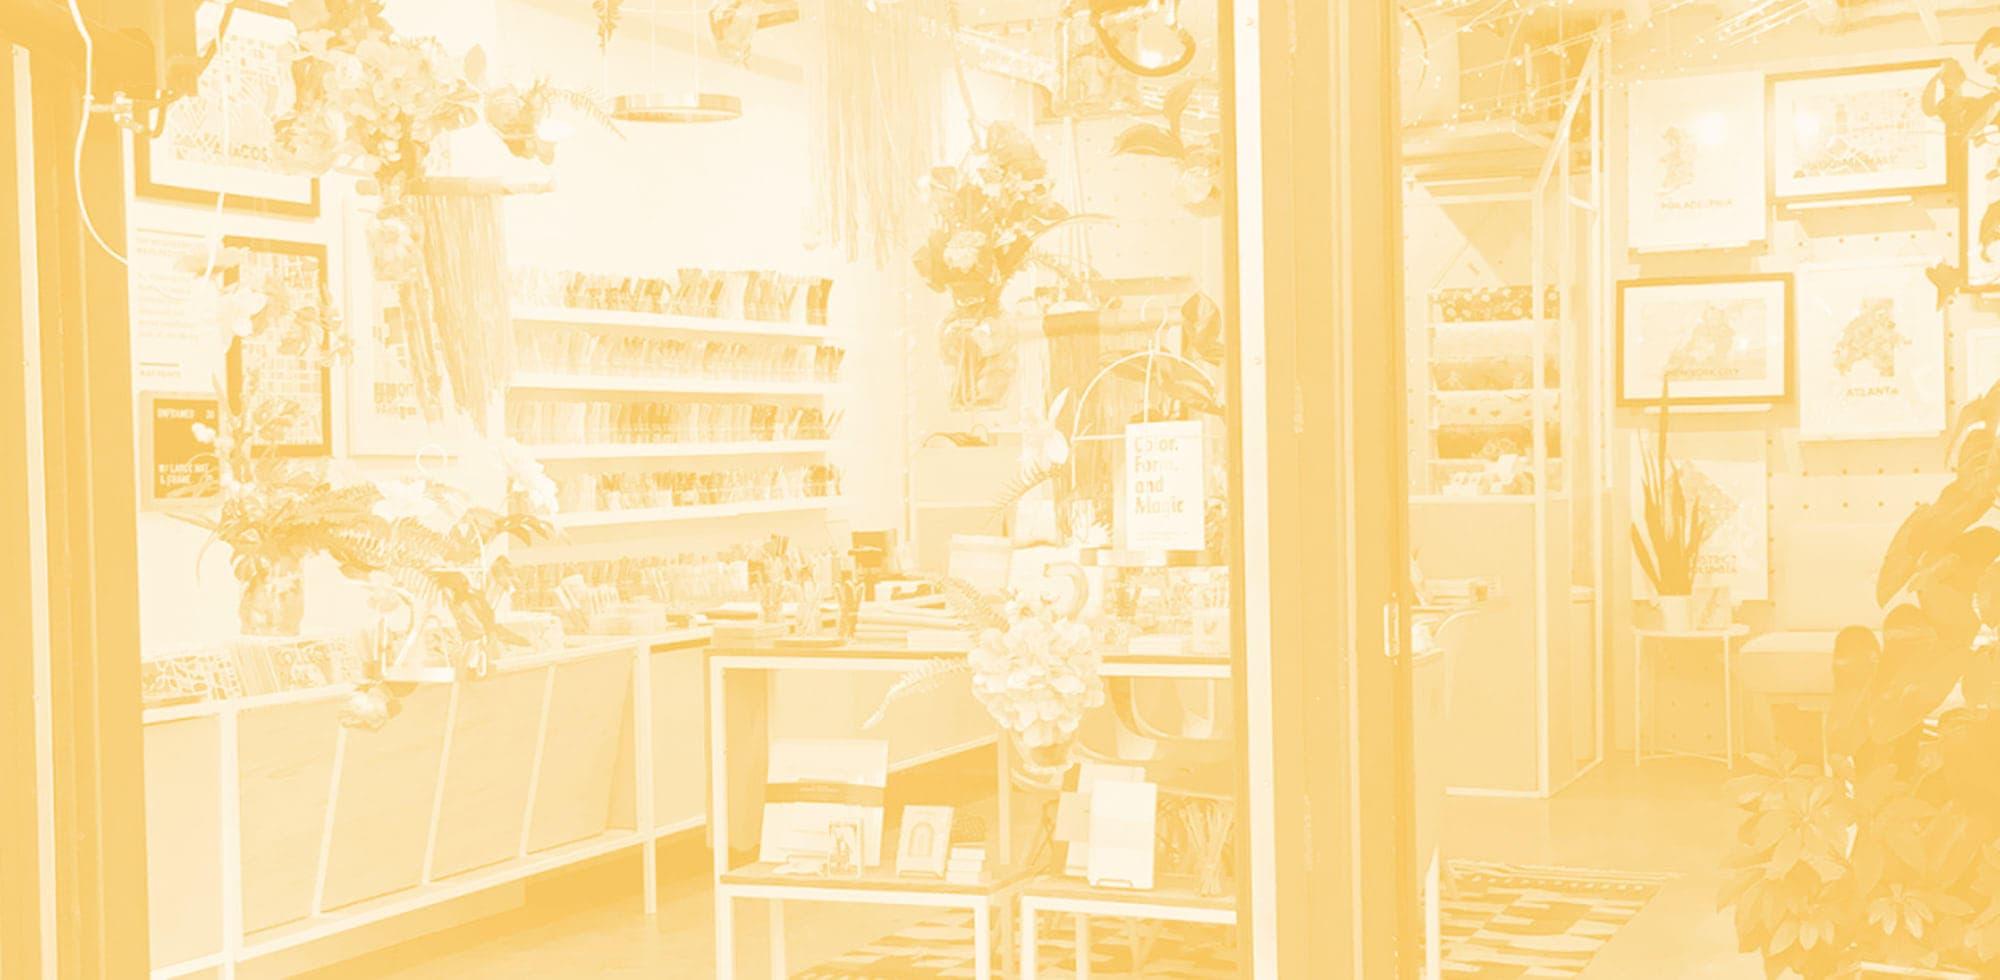 dc design week pop-up shop block party